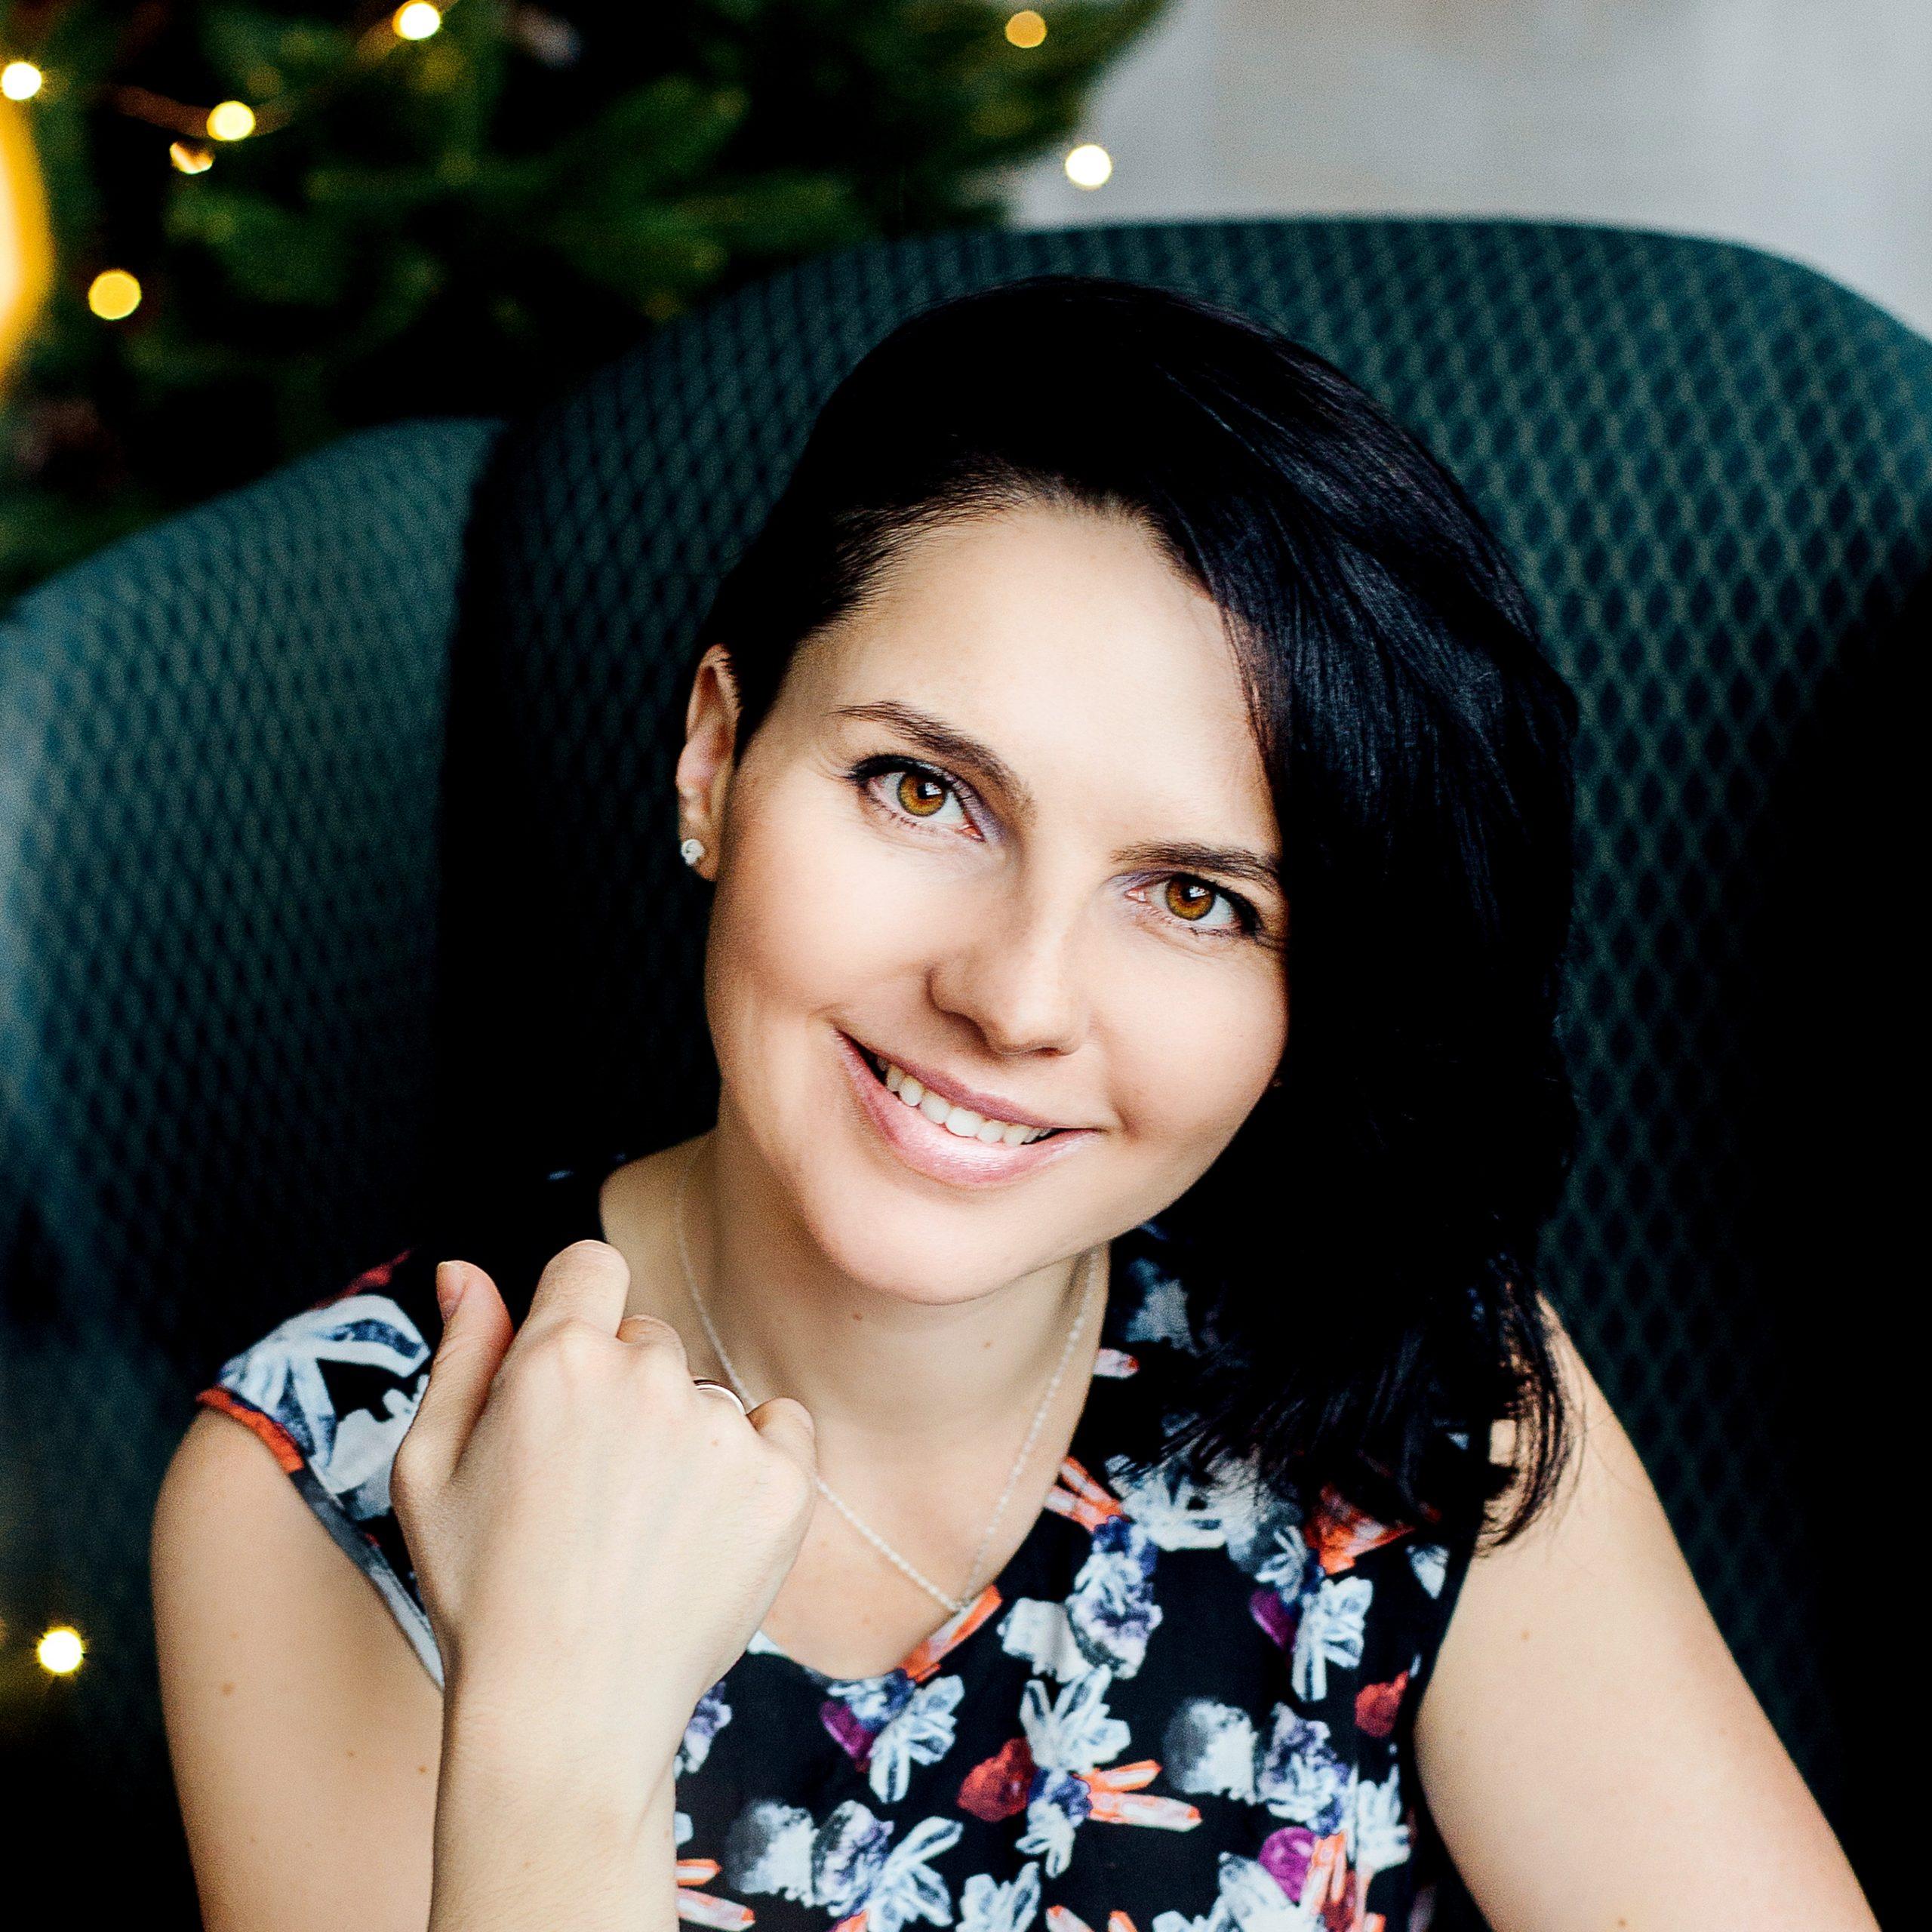 Elena Kniazieva